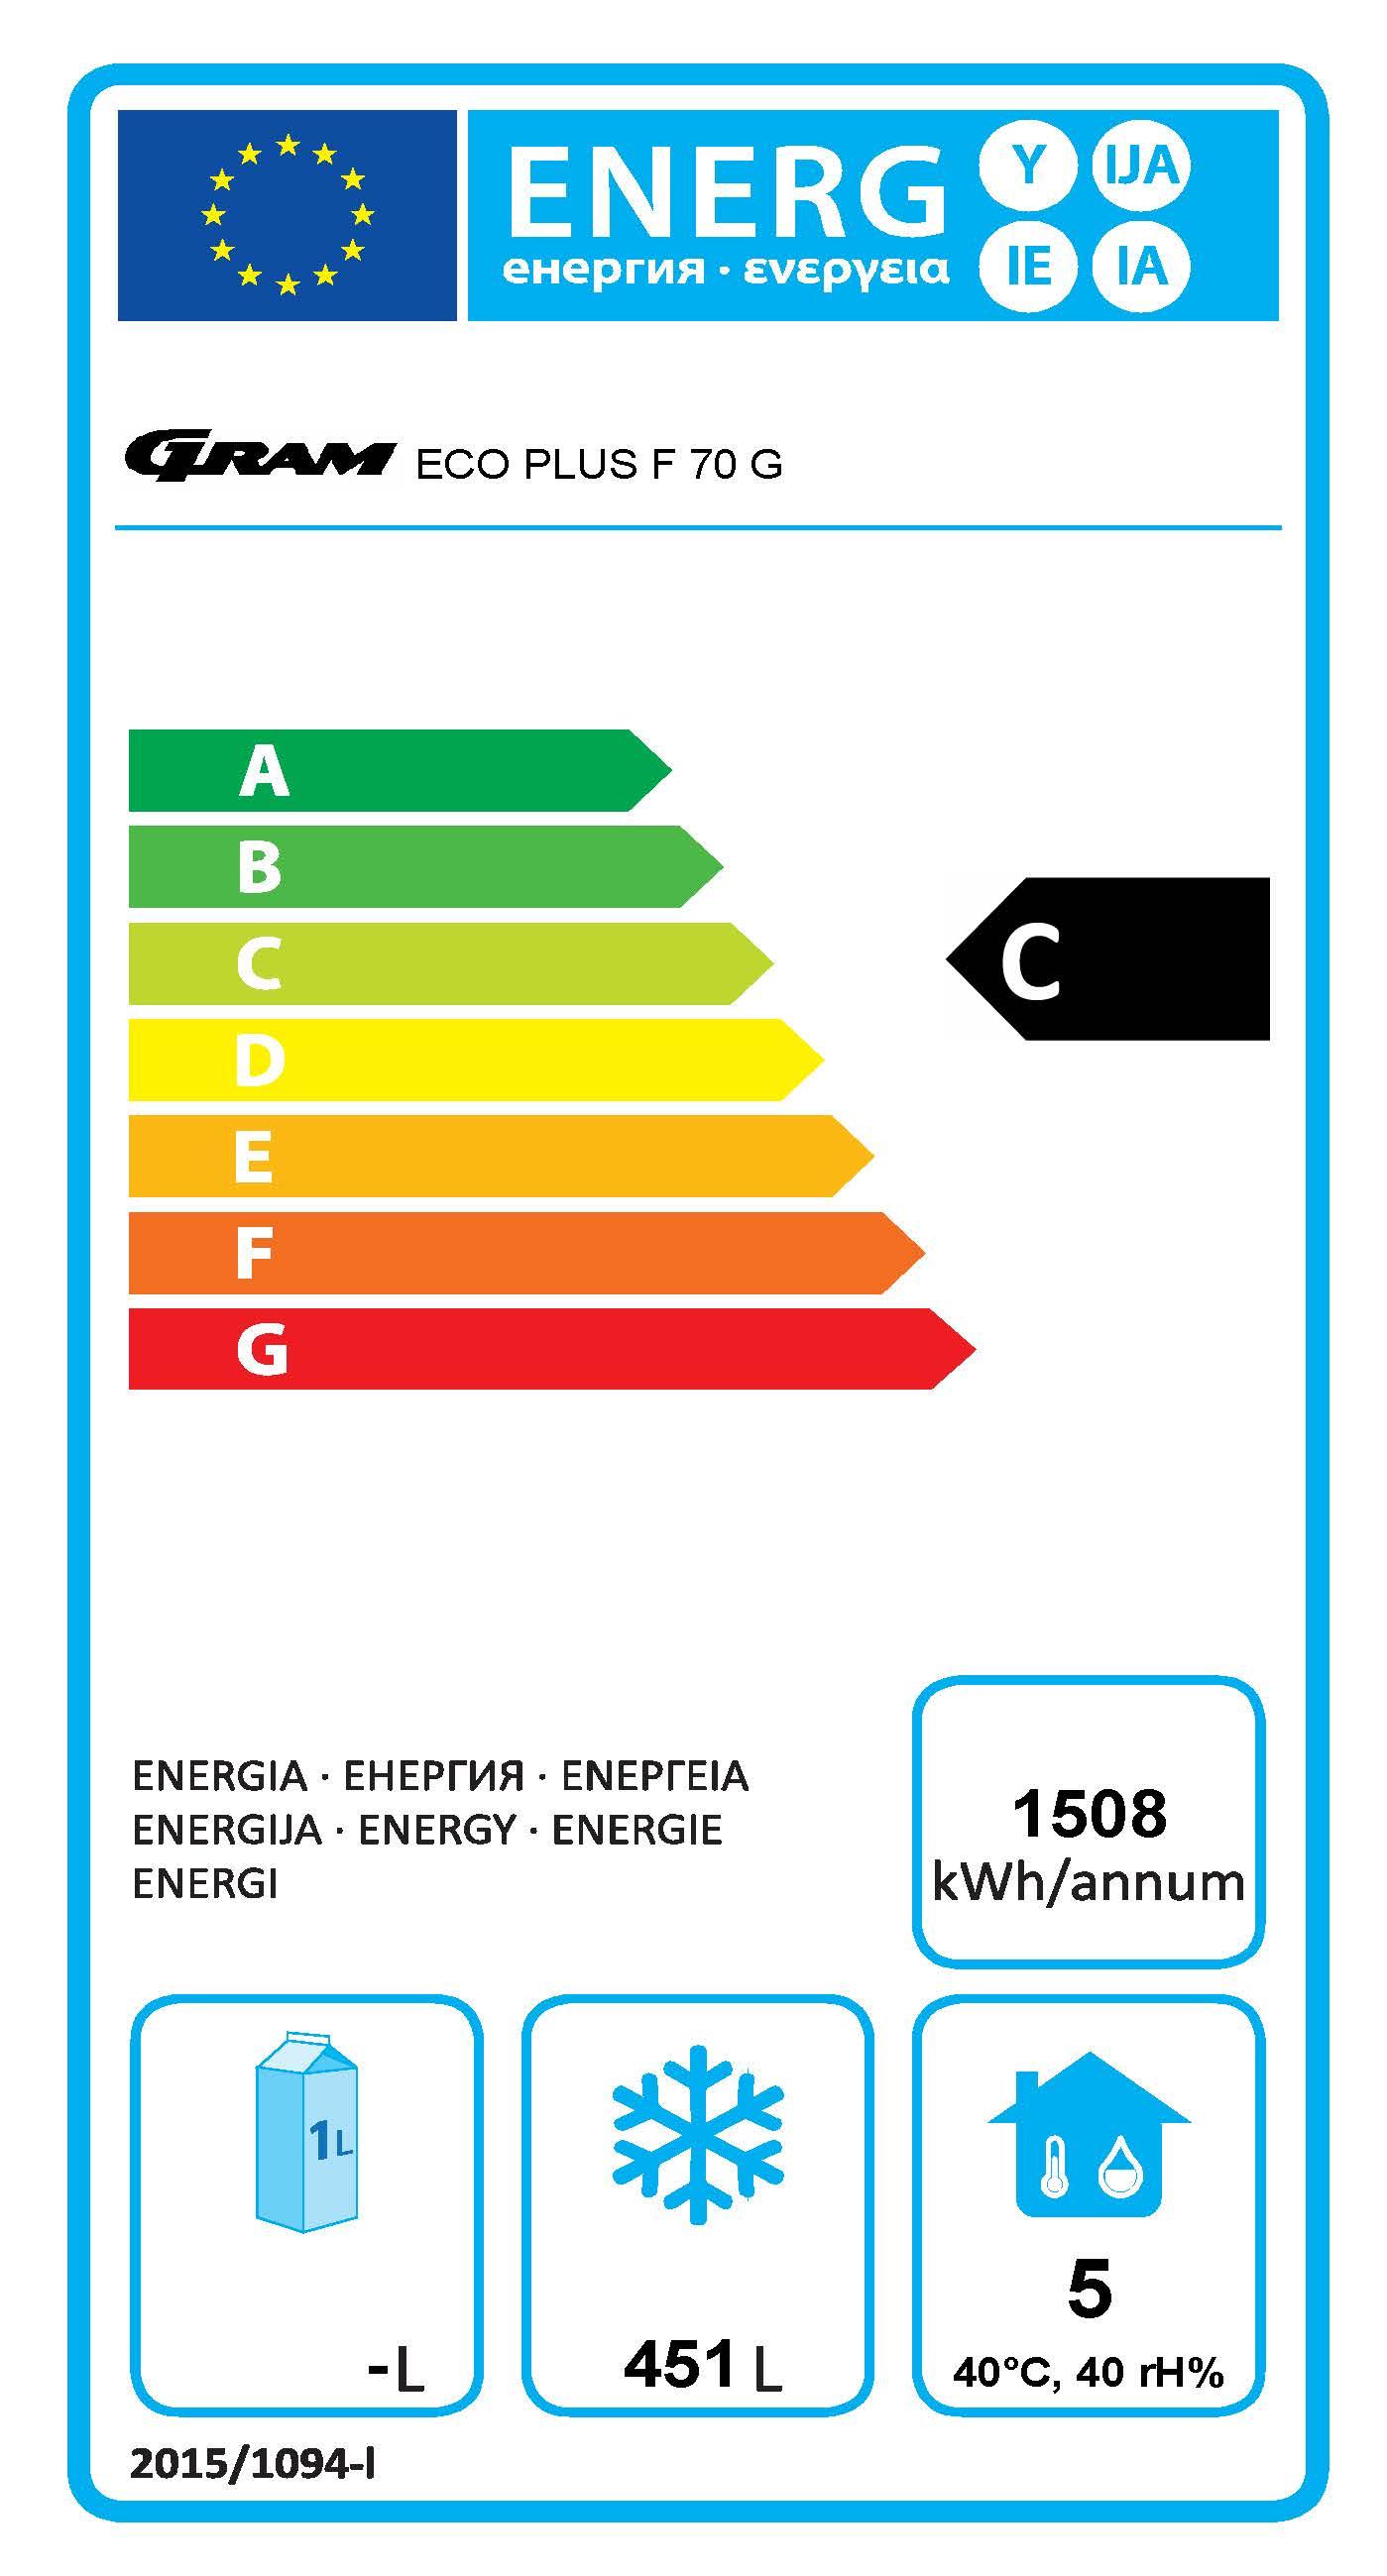 ECO PLUS F 70 BAG C1 4N 610 Ltr 2/1 GN Upright Freezer Energy Rating